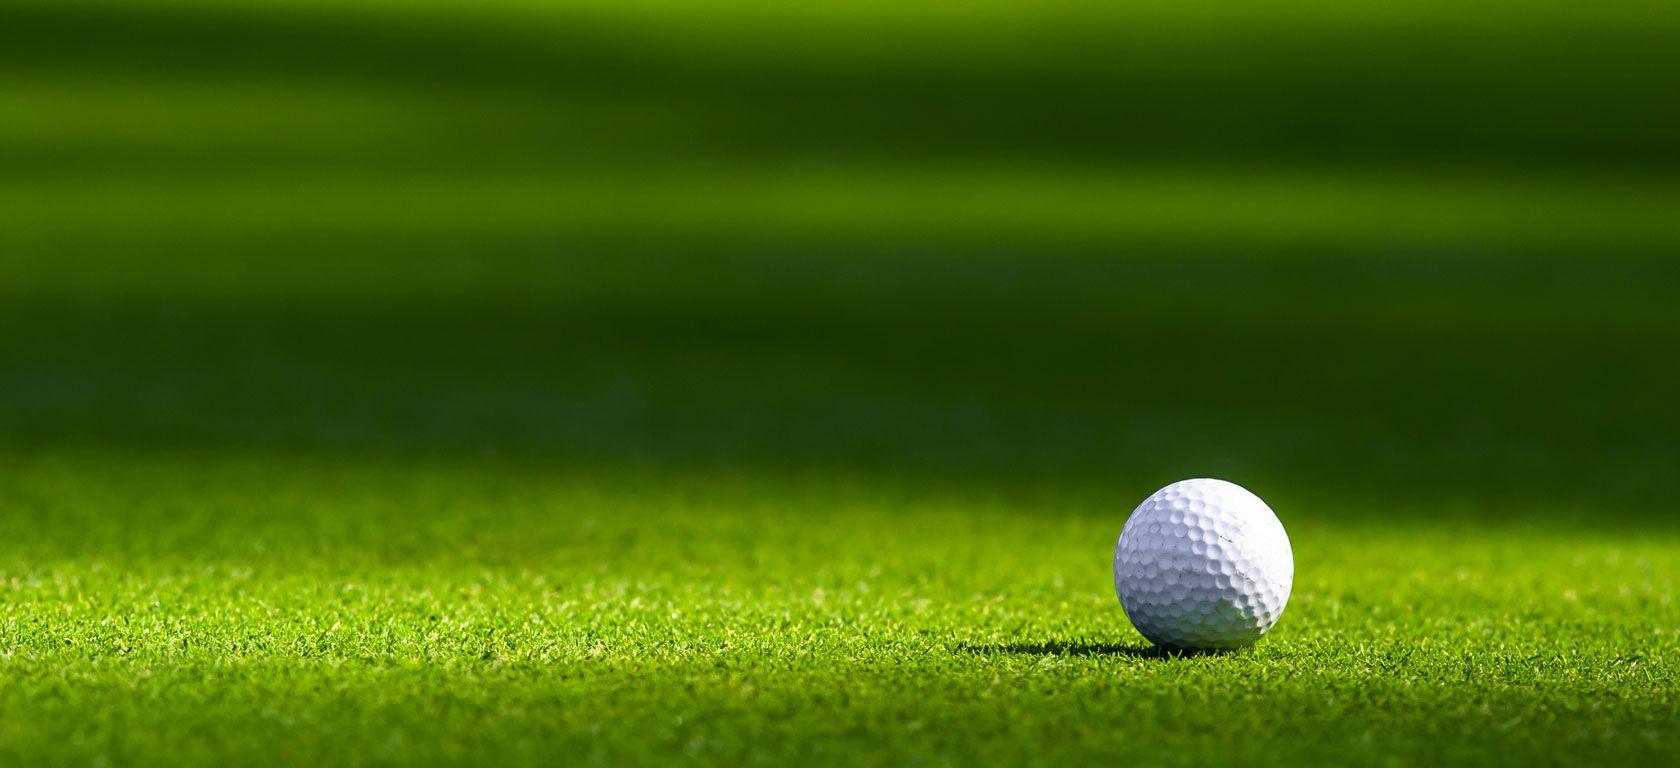 golf-balle